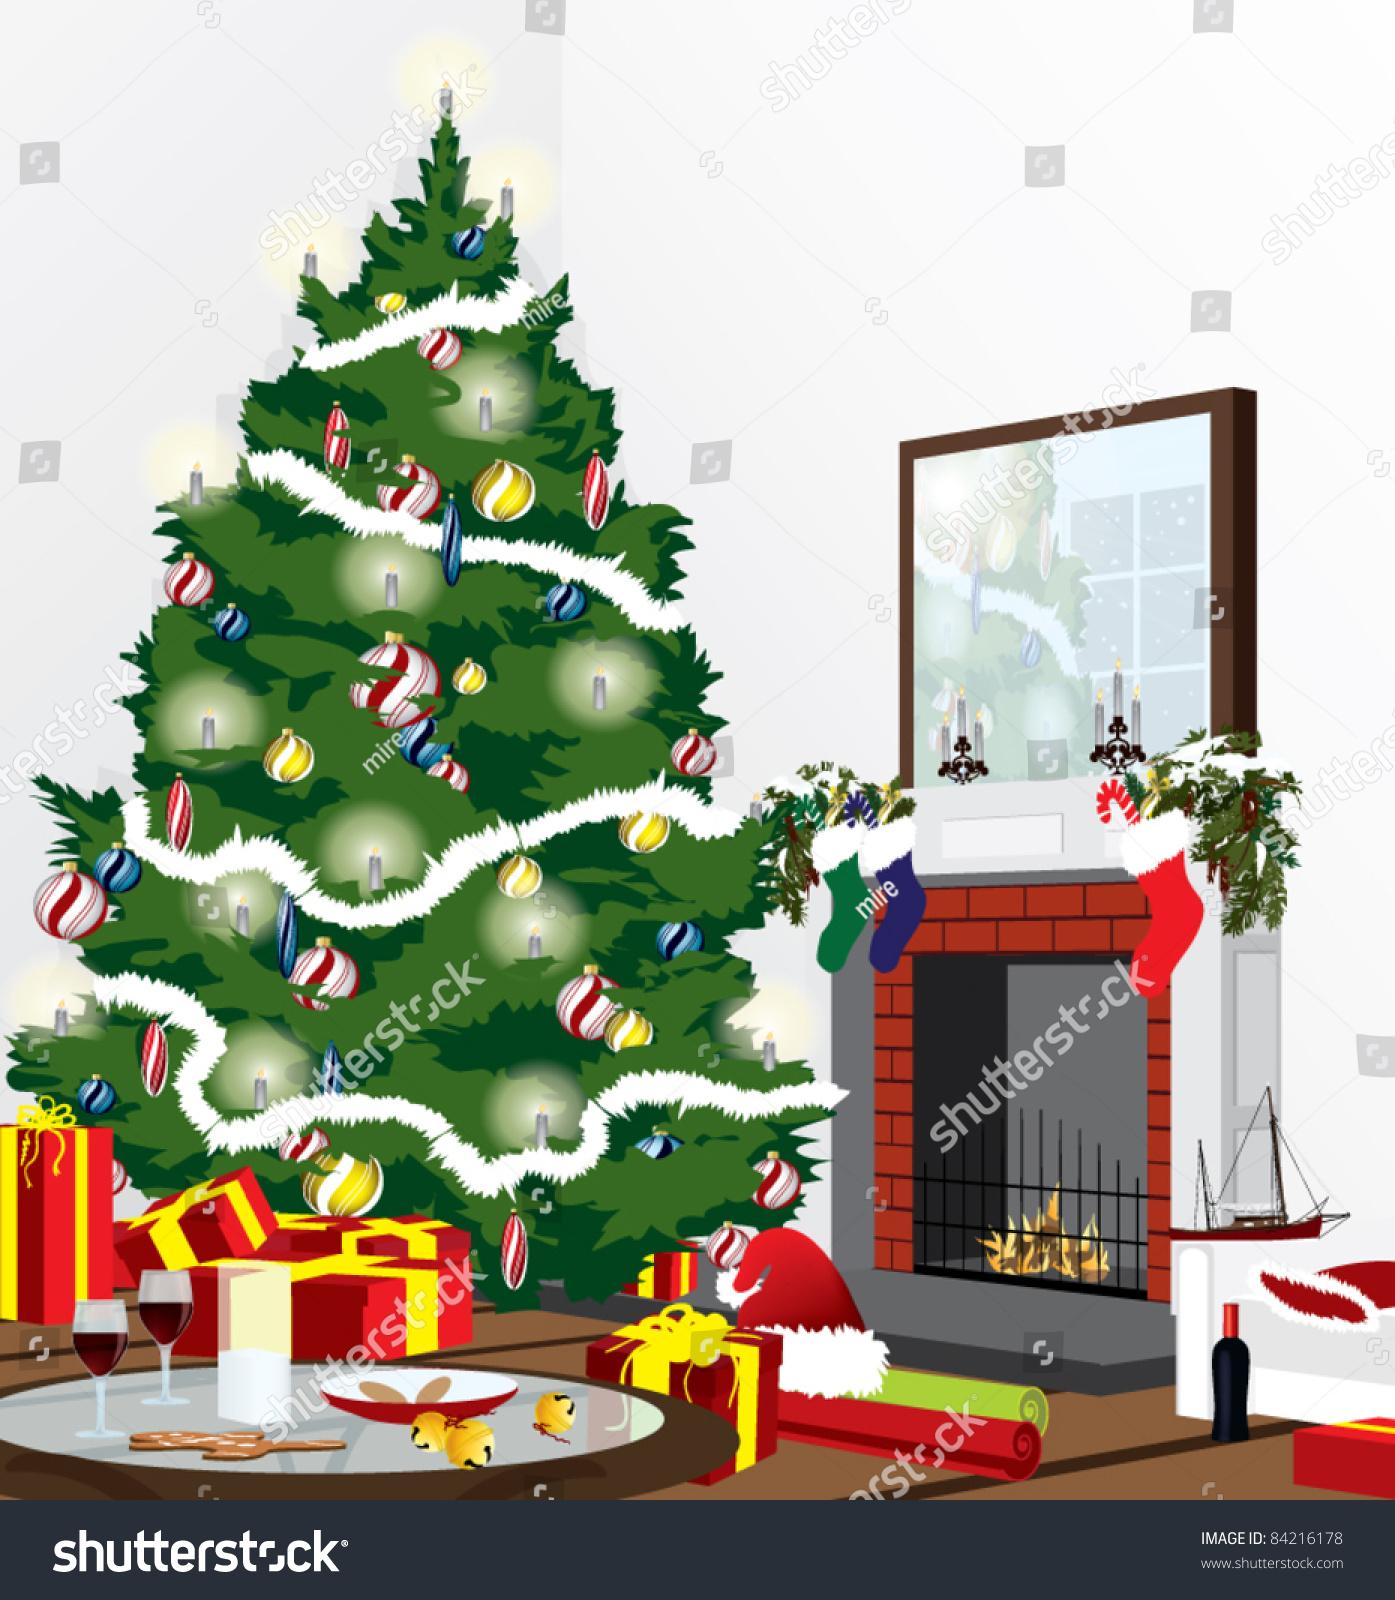 Christmas Room Stock Vector Image Of Illuminated: Christmas Eve Scene In A Living Room Stock Vector